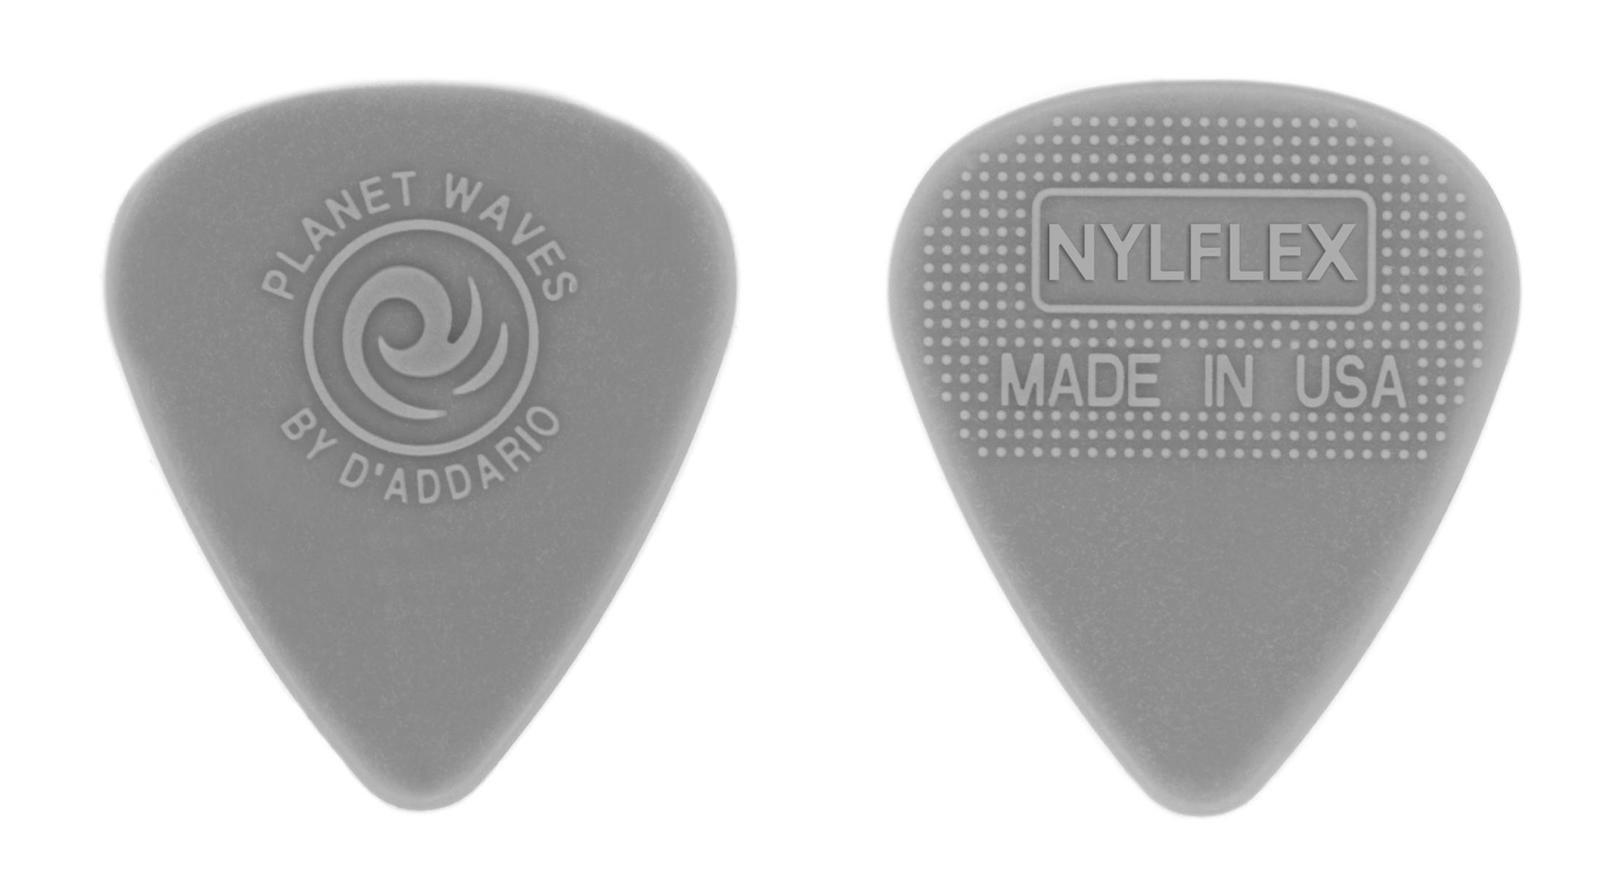 Planet Waves Nylflex Guitar Picks, 10 pack, Medium